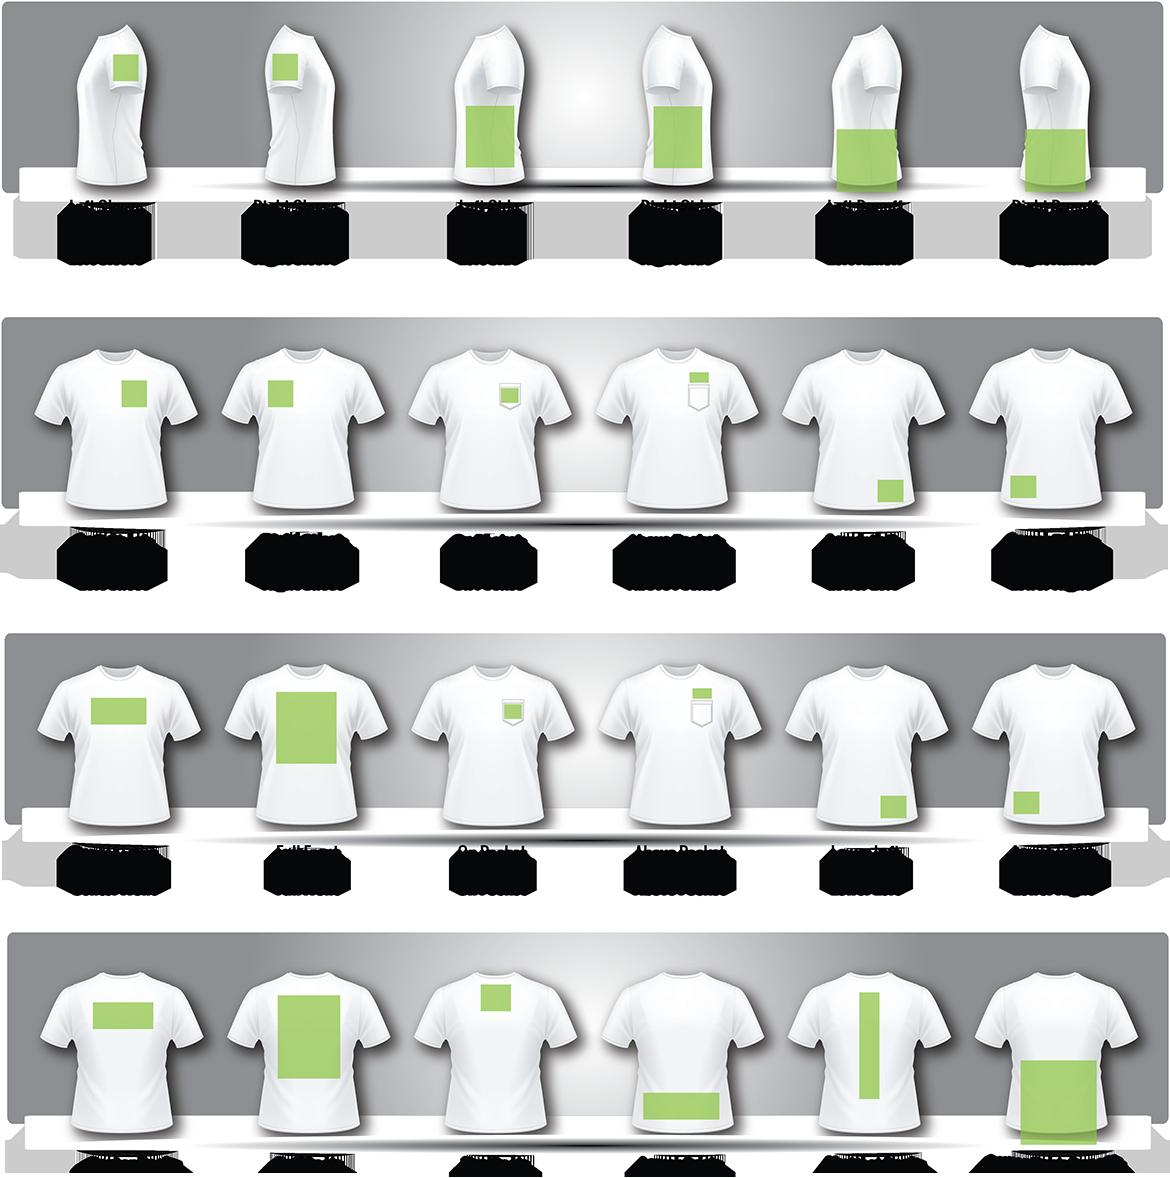 Size Of T Shirt Design Google Search: Screen Print Size Chart - Google Search